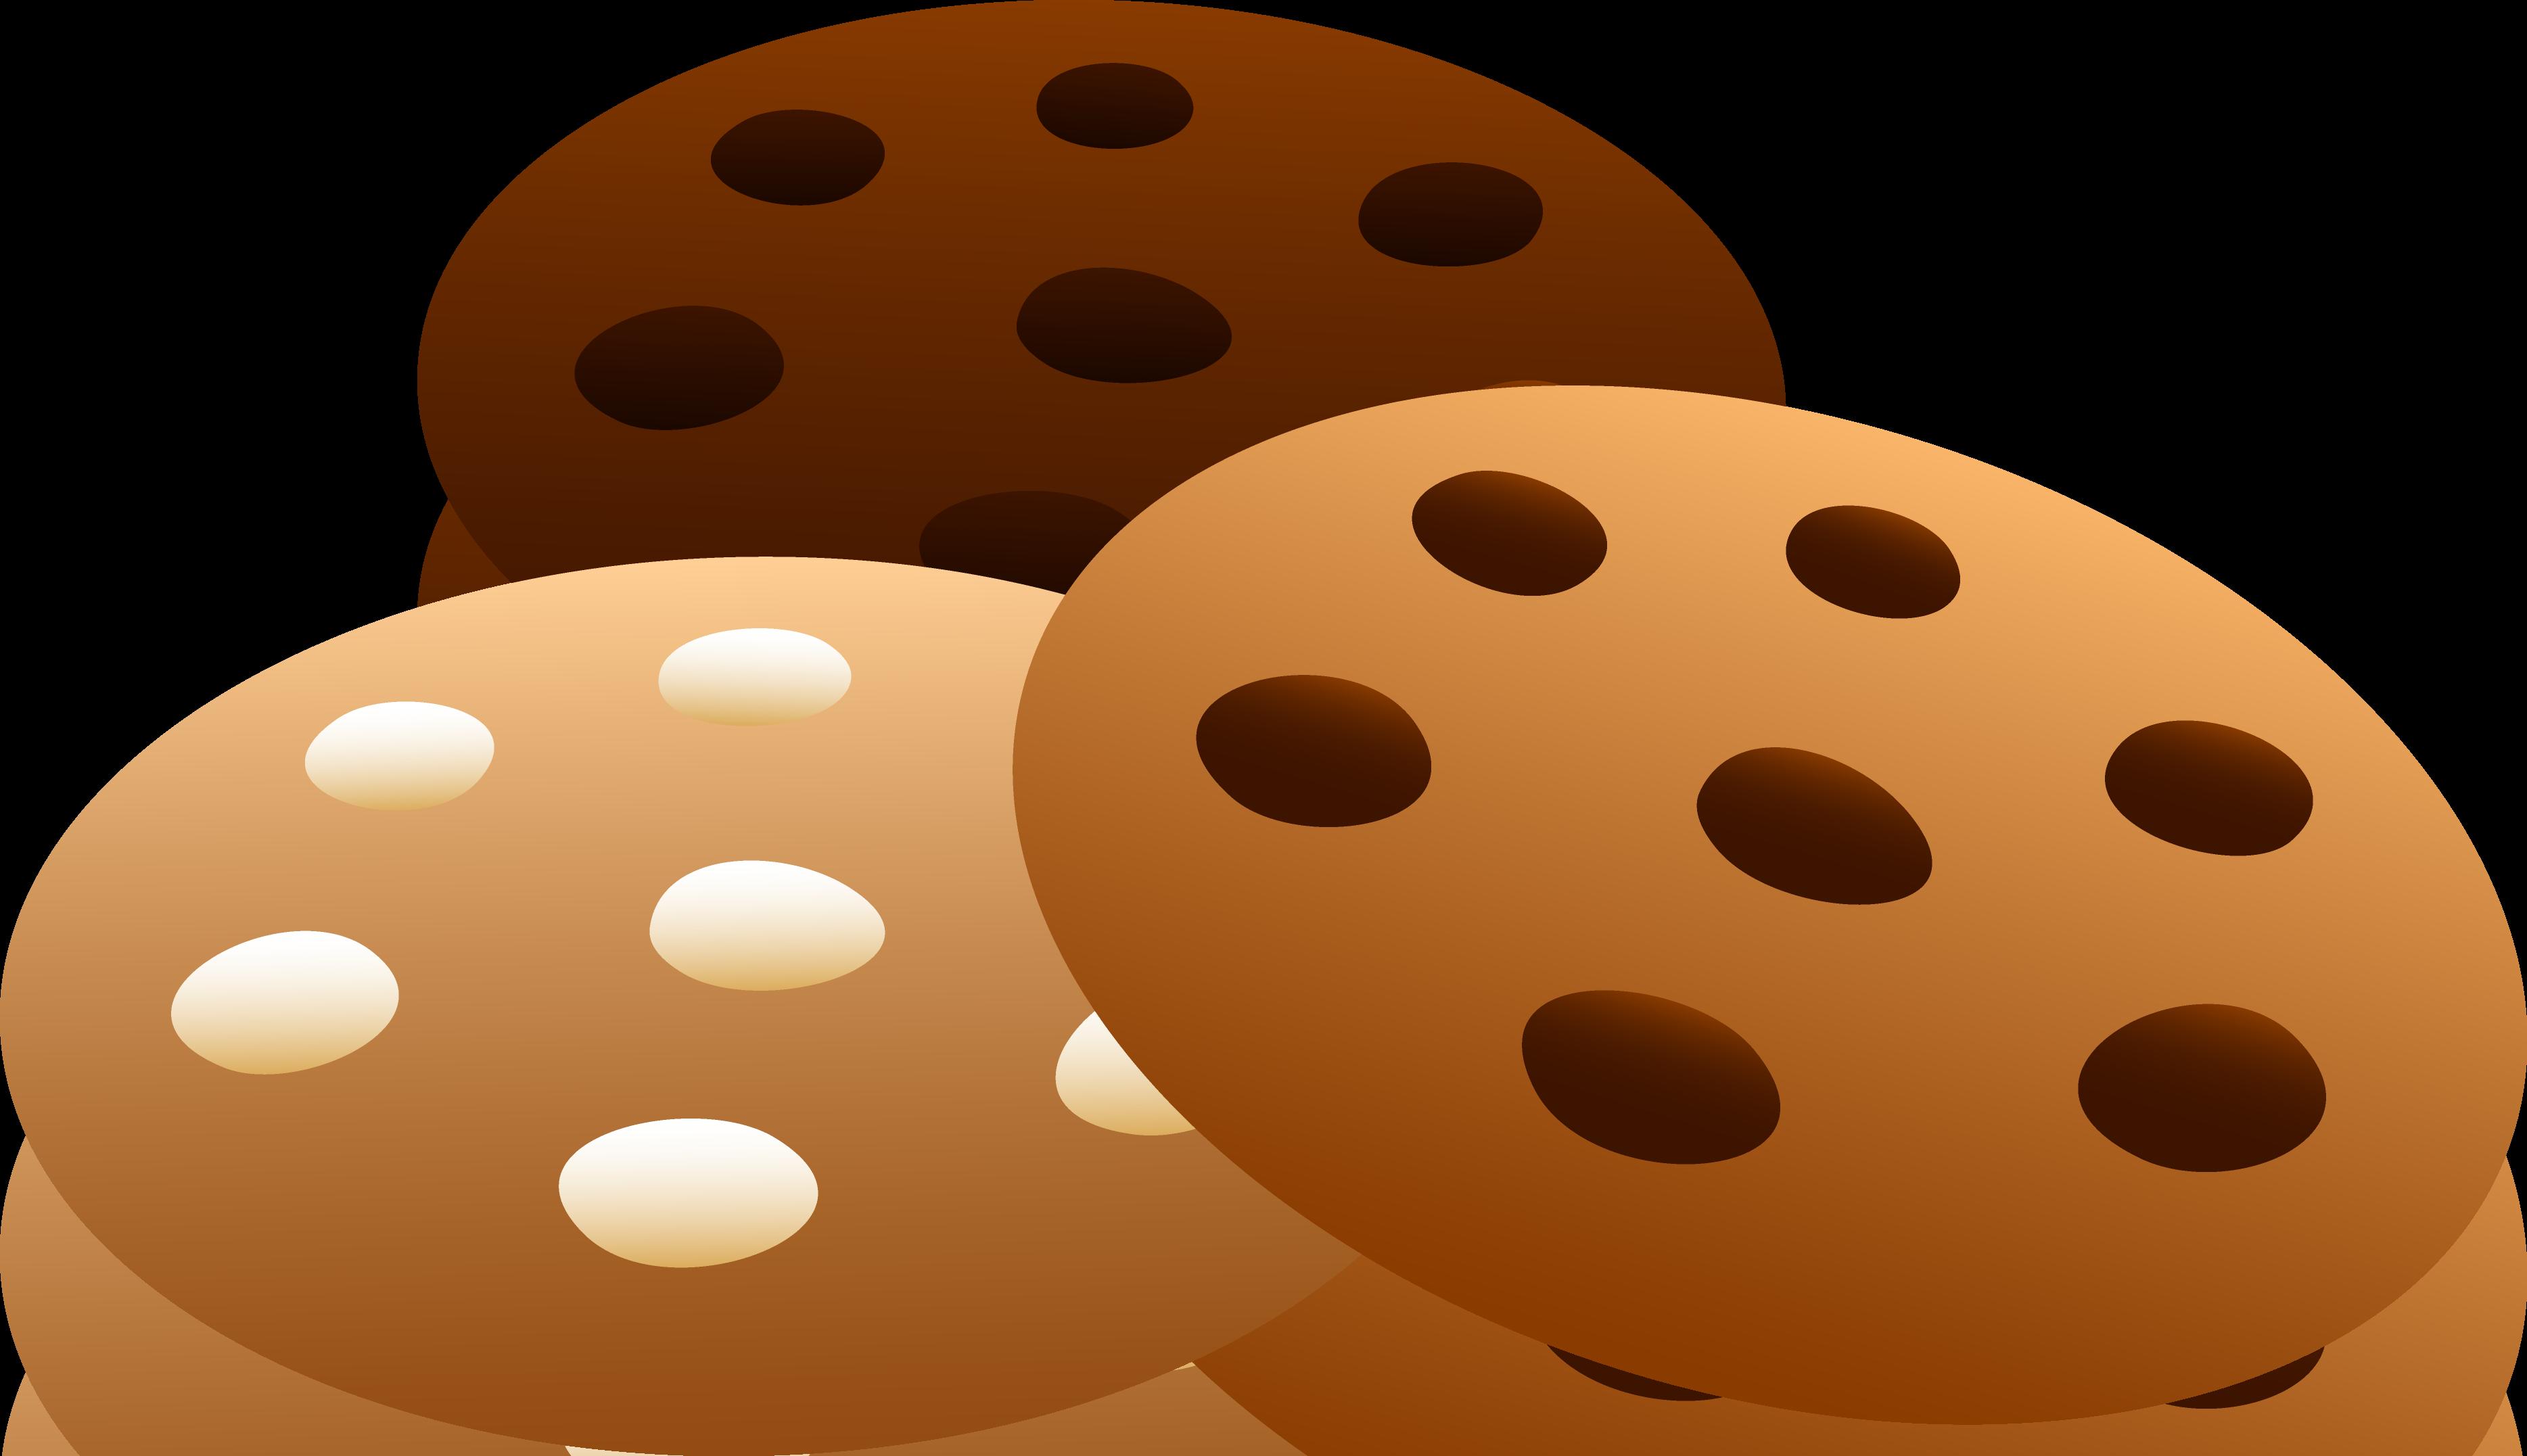 Three Flavors of Cookies.